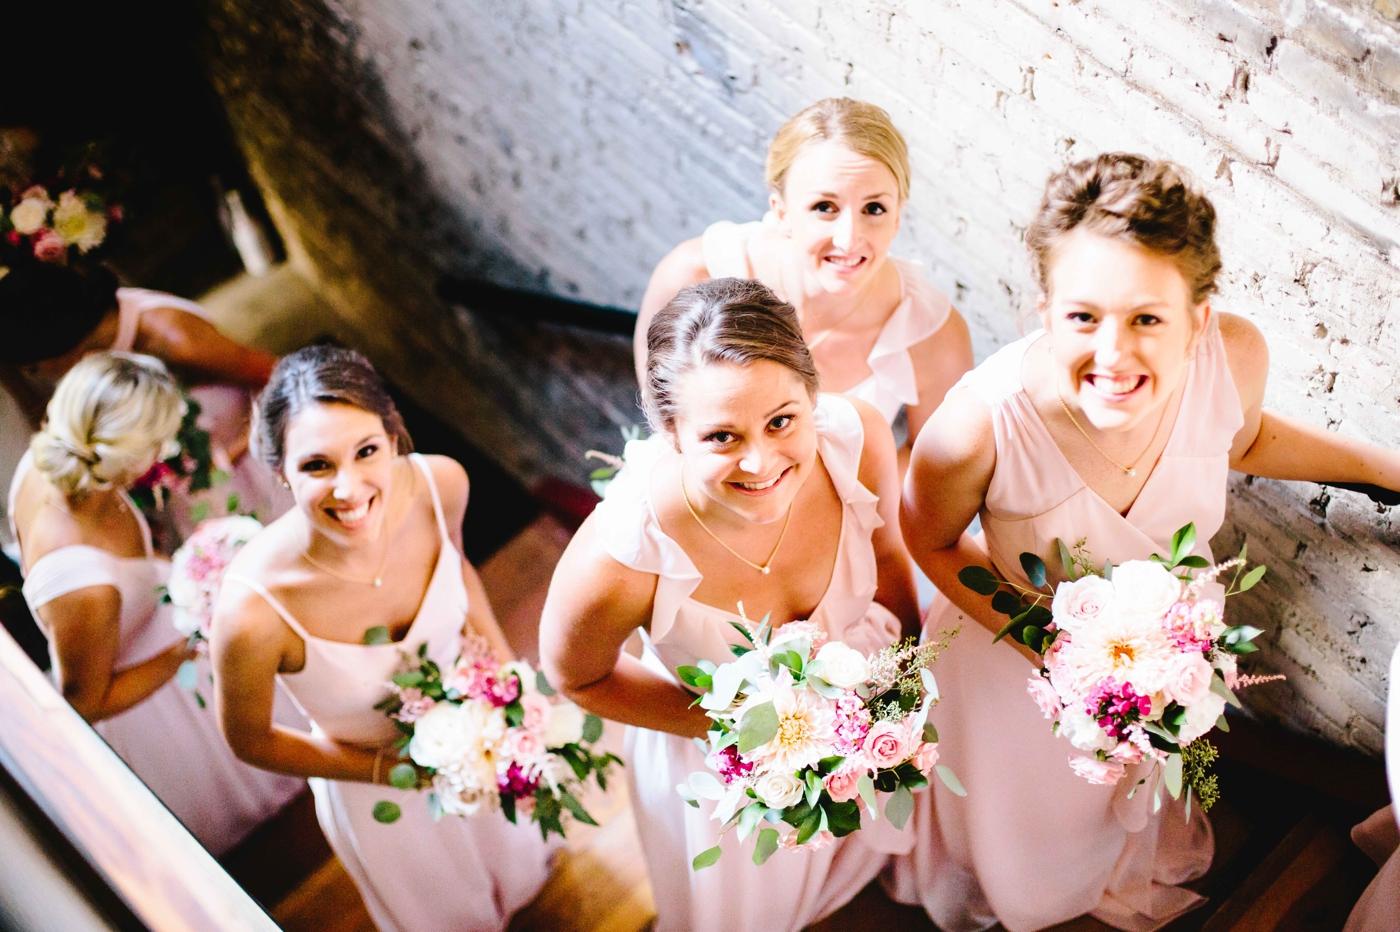 chicago-fine-art-wedding-photography-tyma20